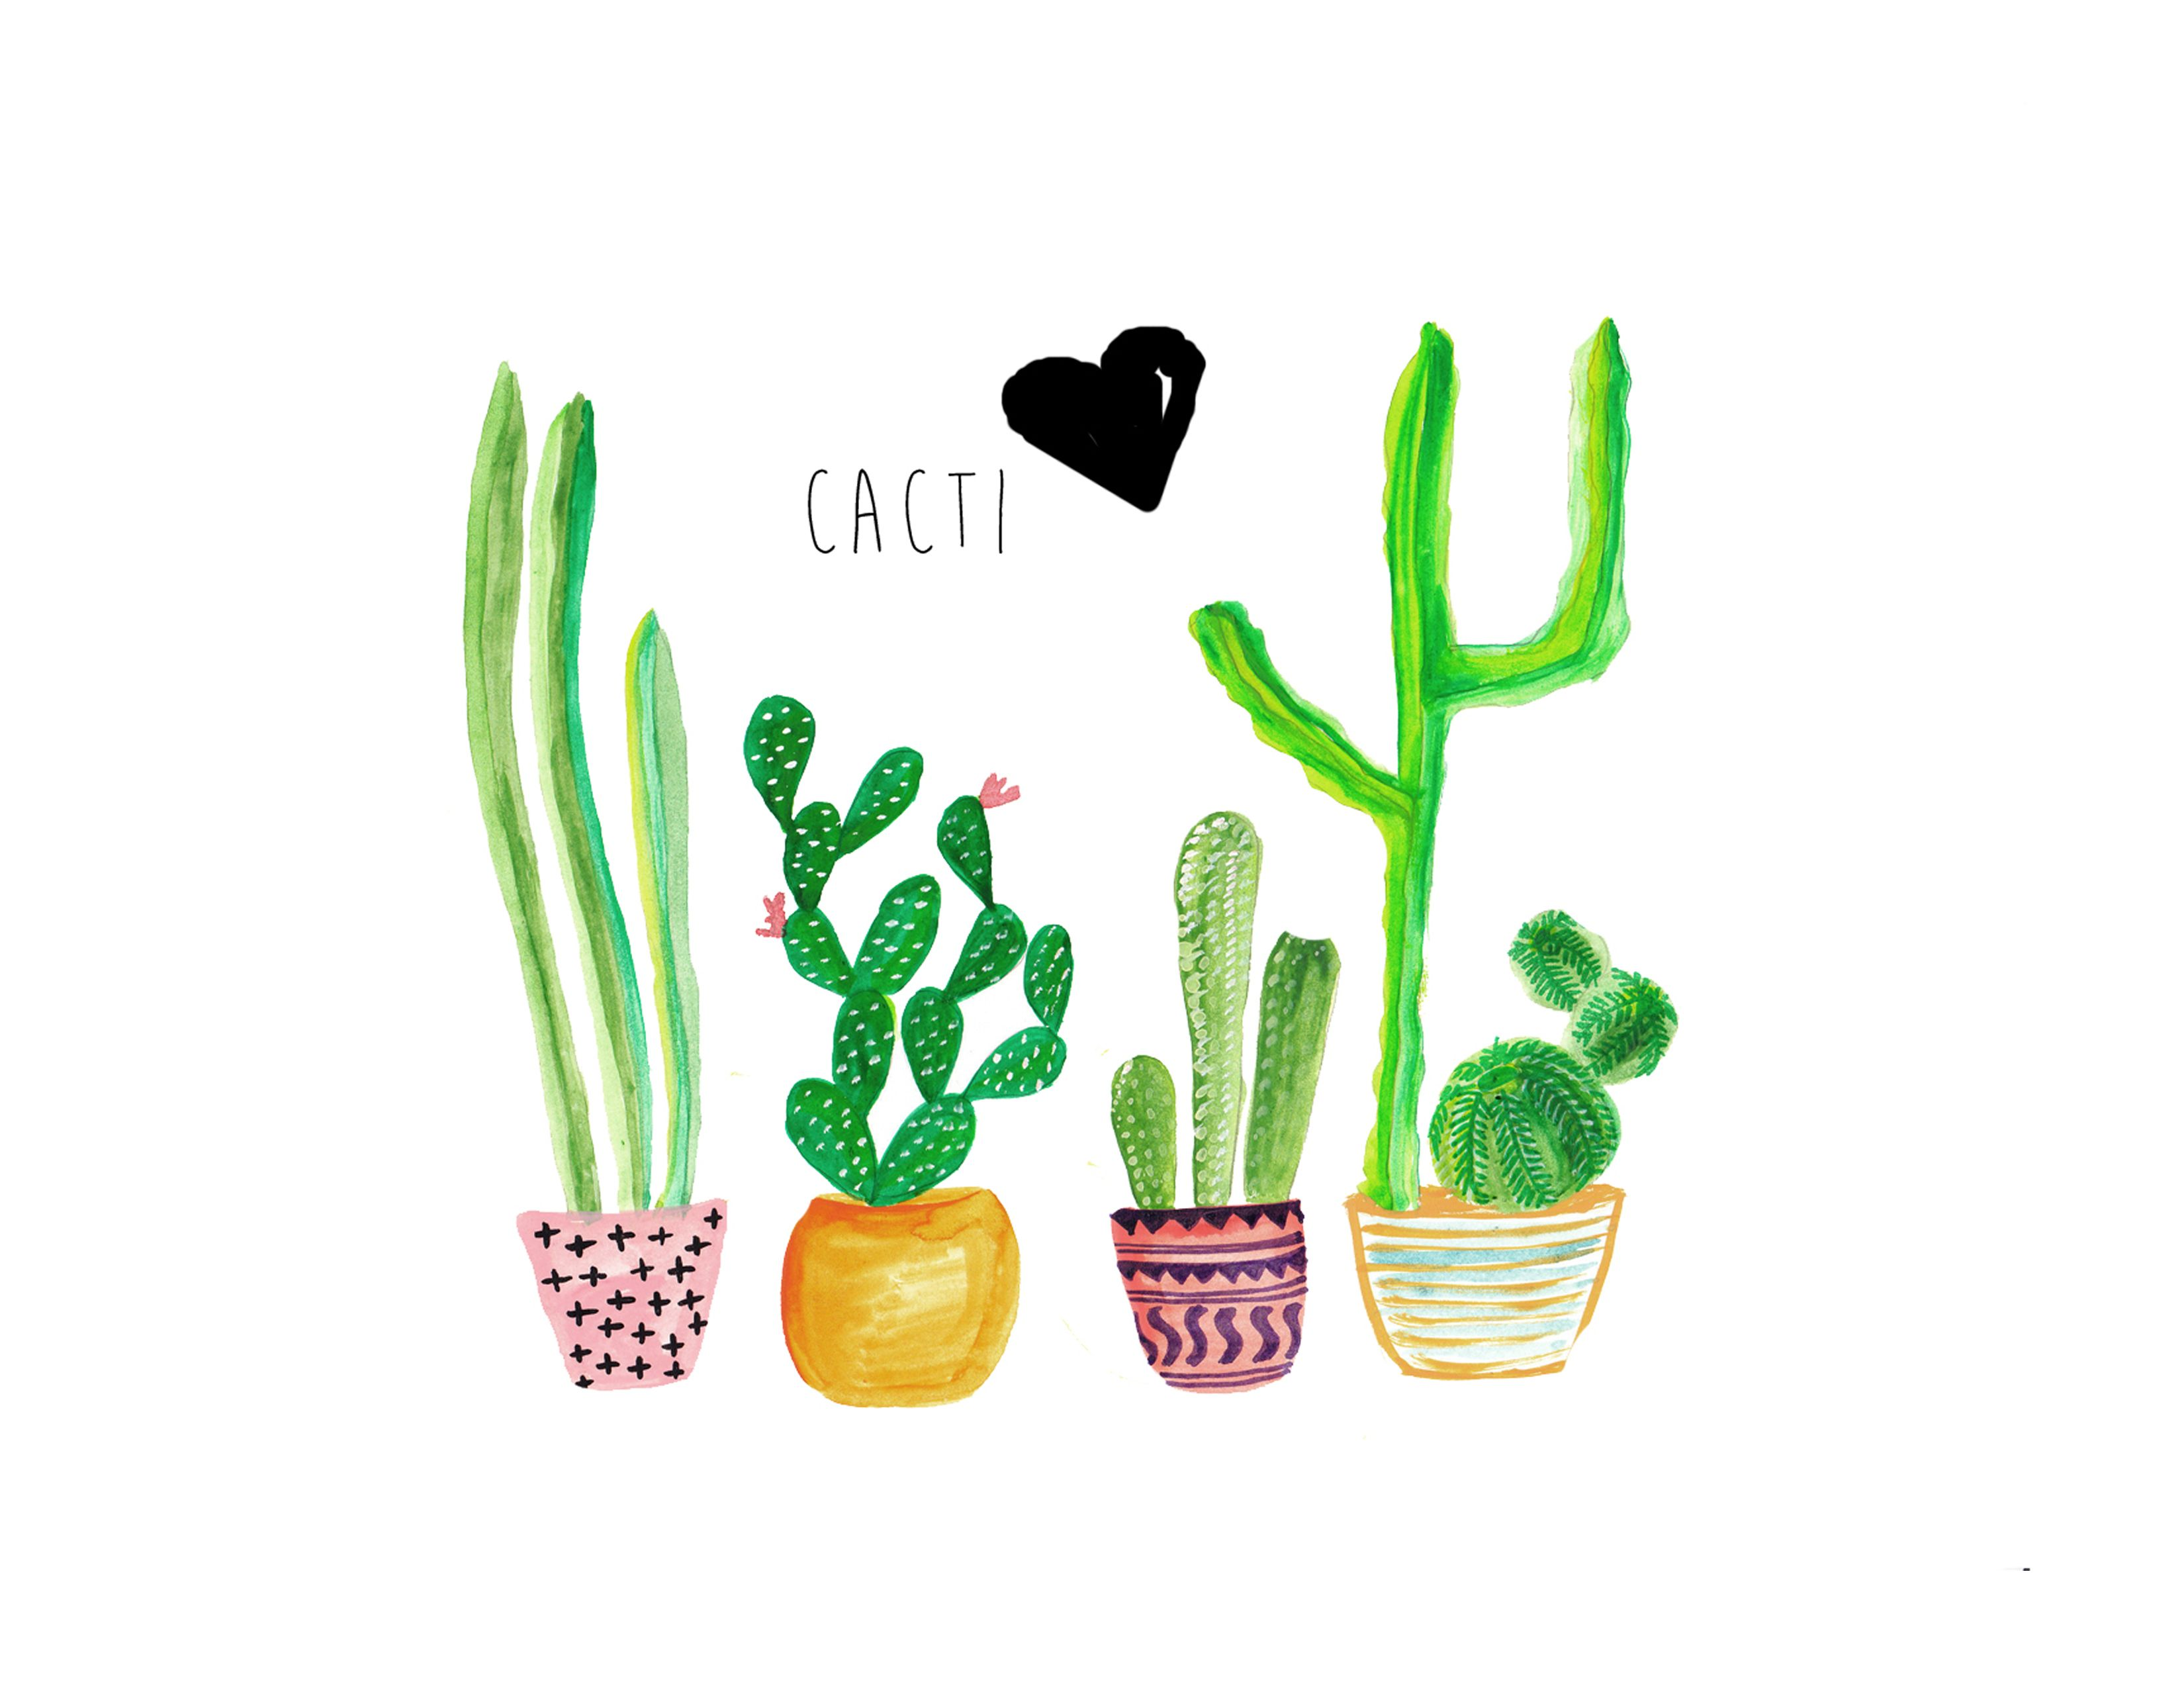 Http Designforsoul Com Wp Content Uploads 2015 05 Cacti Artprint 1 Jpg Cactus Backgrounds Cute Computer Backgrounds Cactus